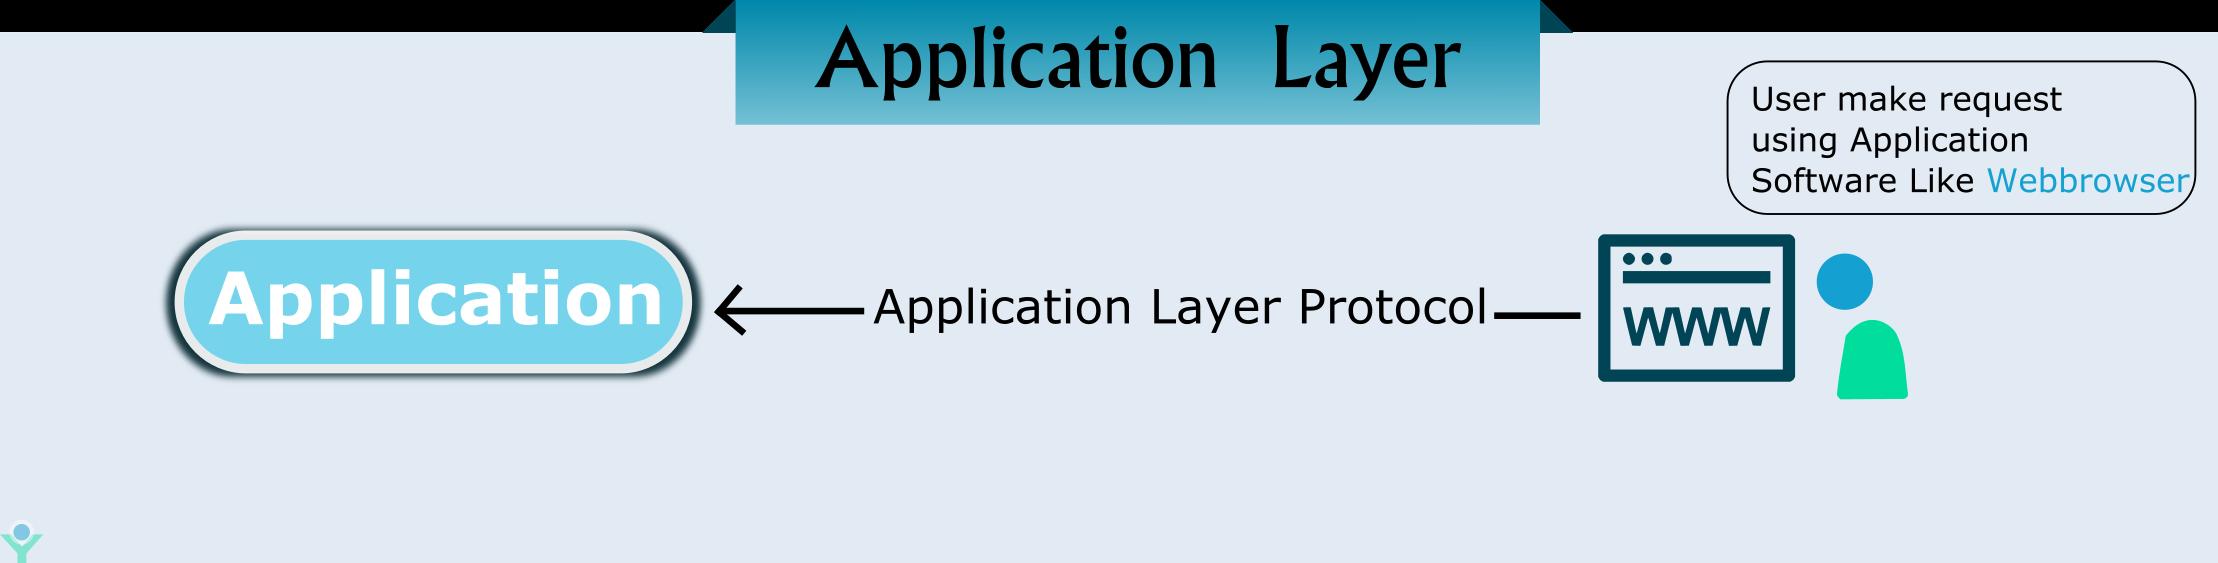 application layer in osi model